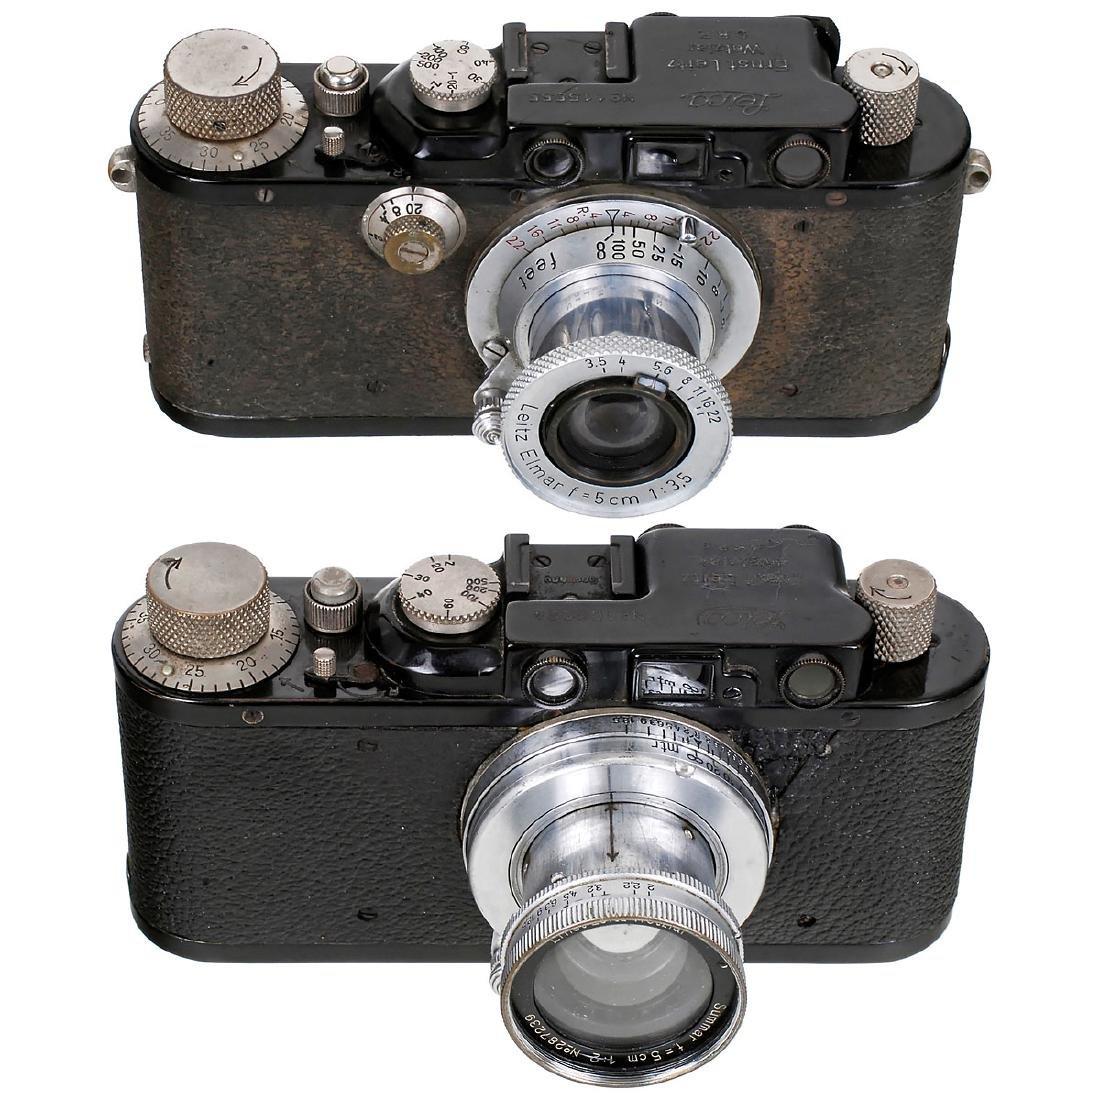 Leica II (D) and Leica III (F)